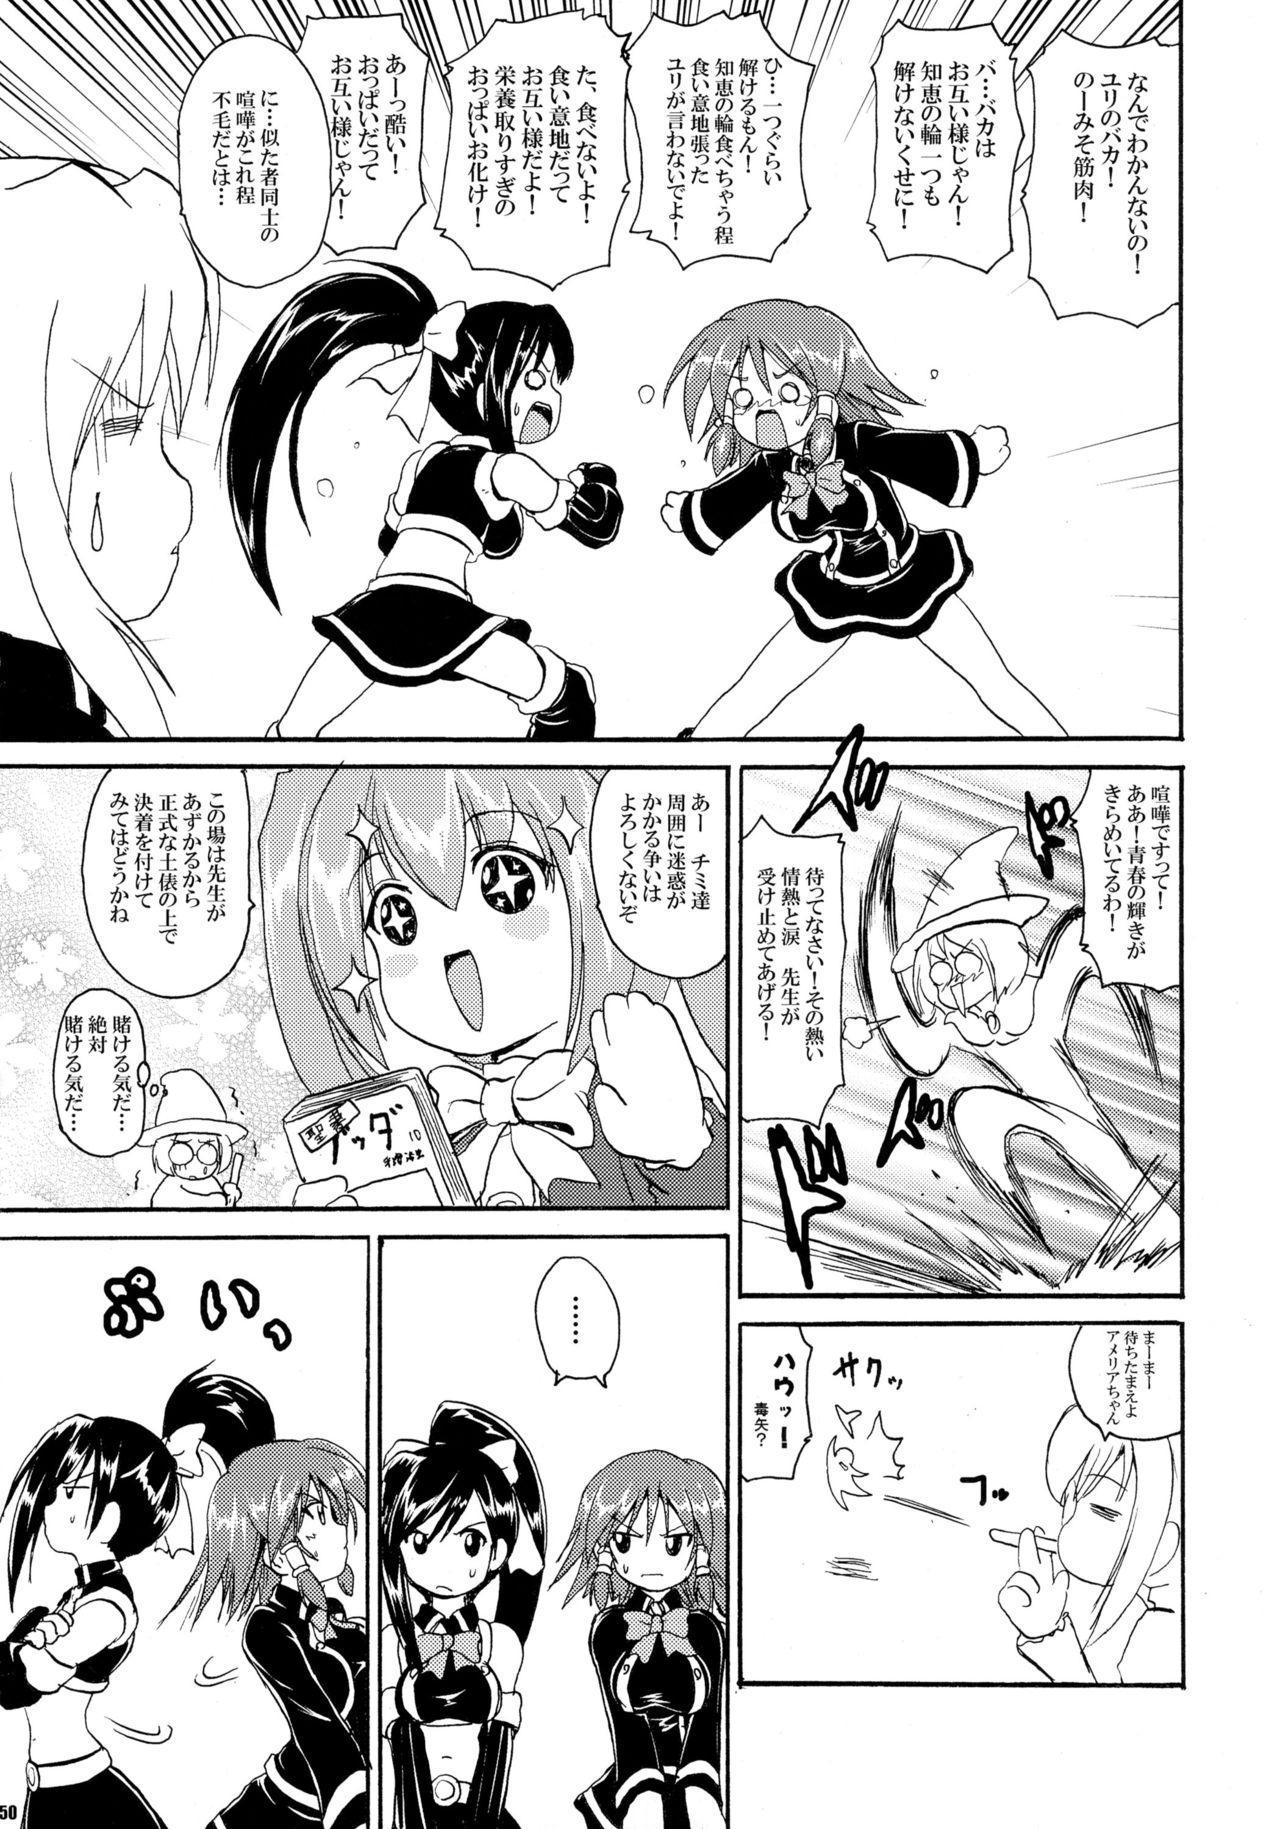 Kakomondai Shuu Soushuuhen + Alpha 49